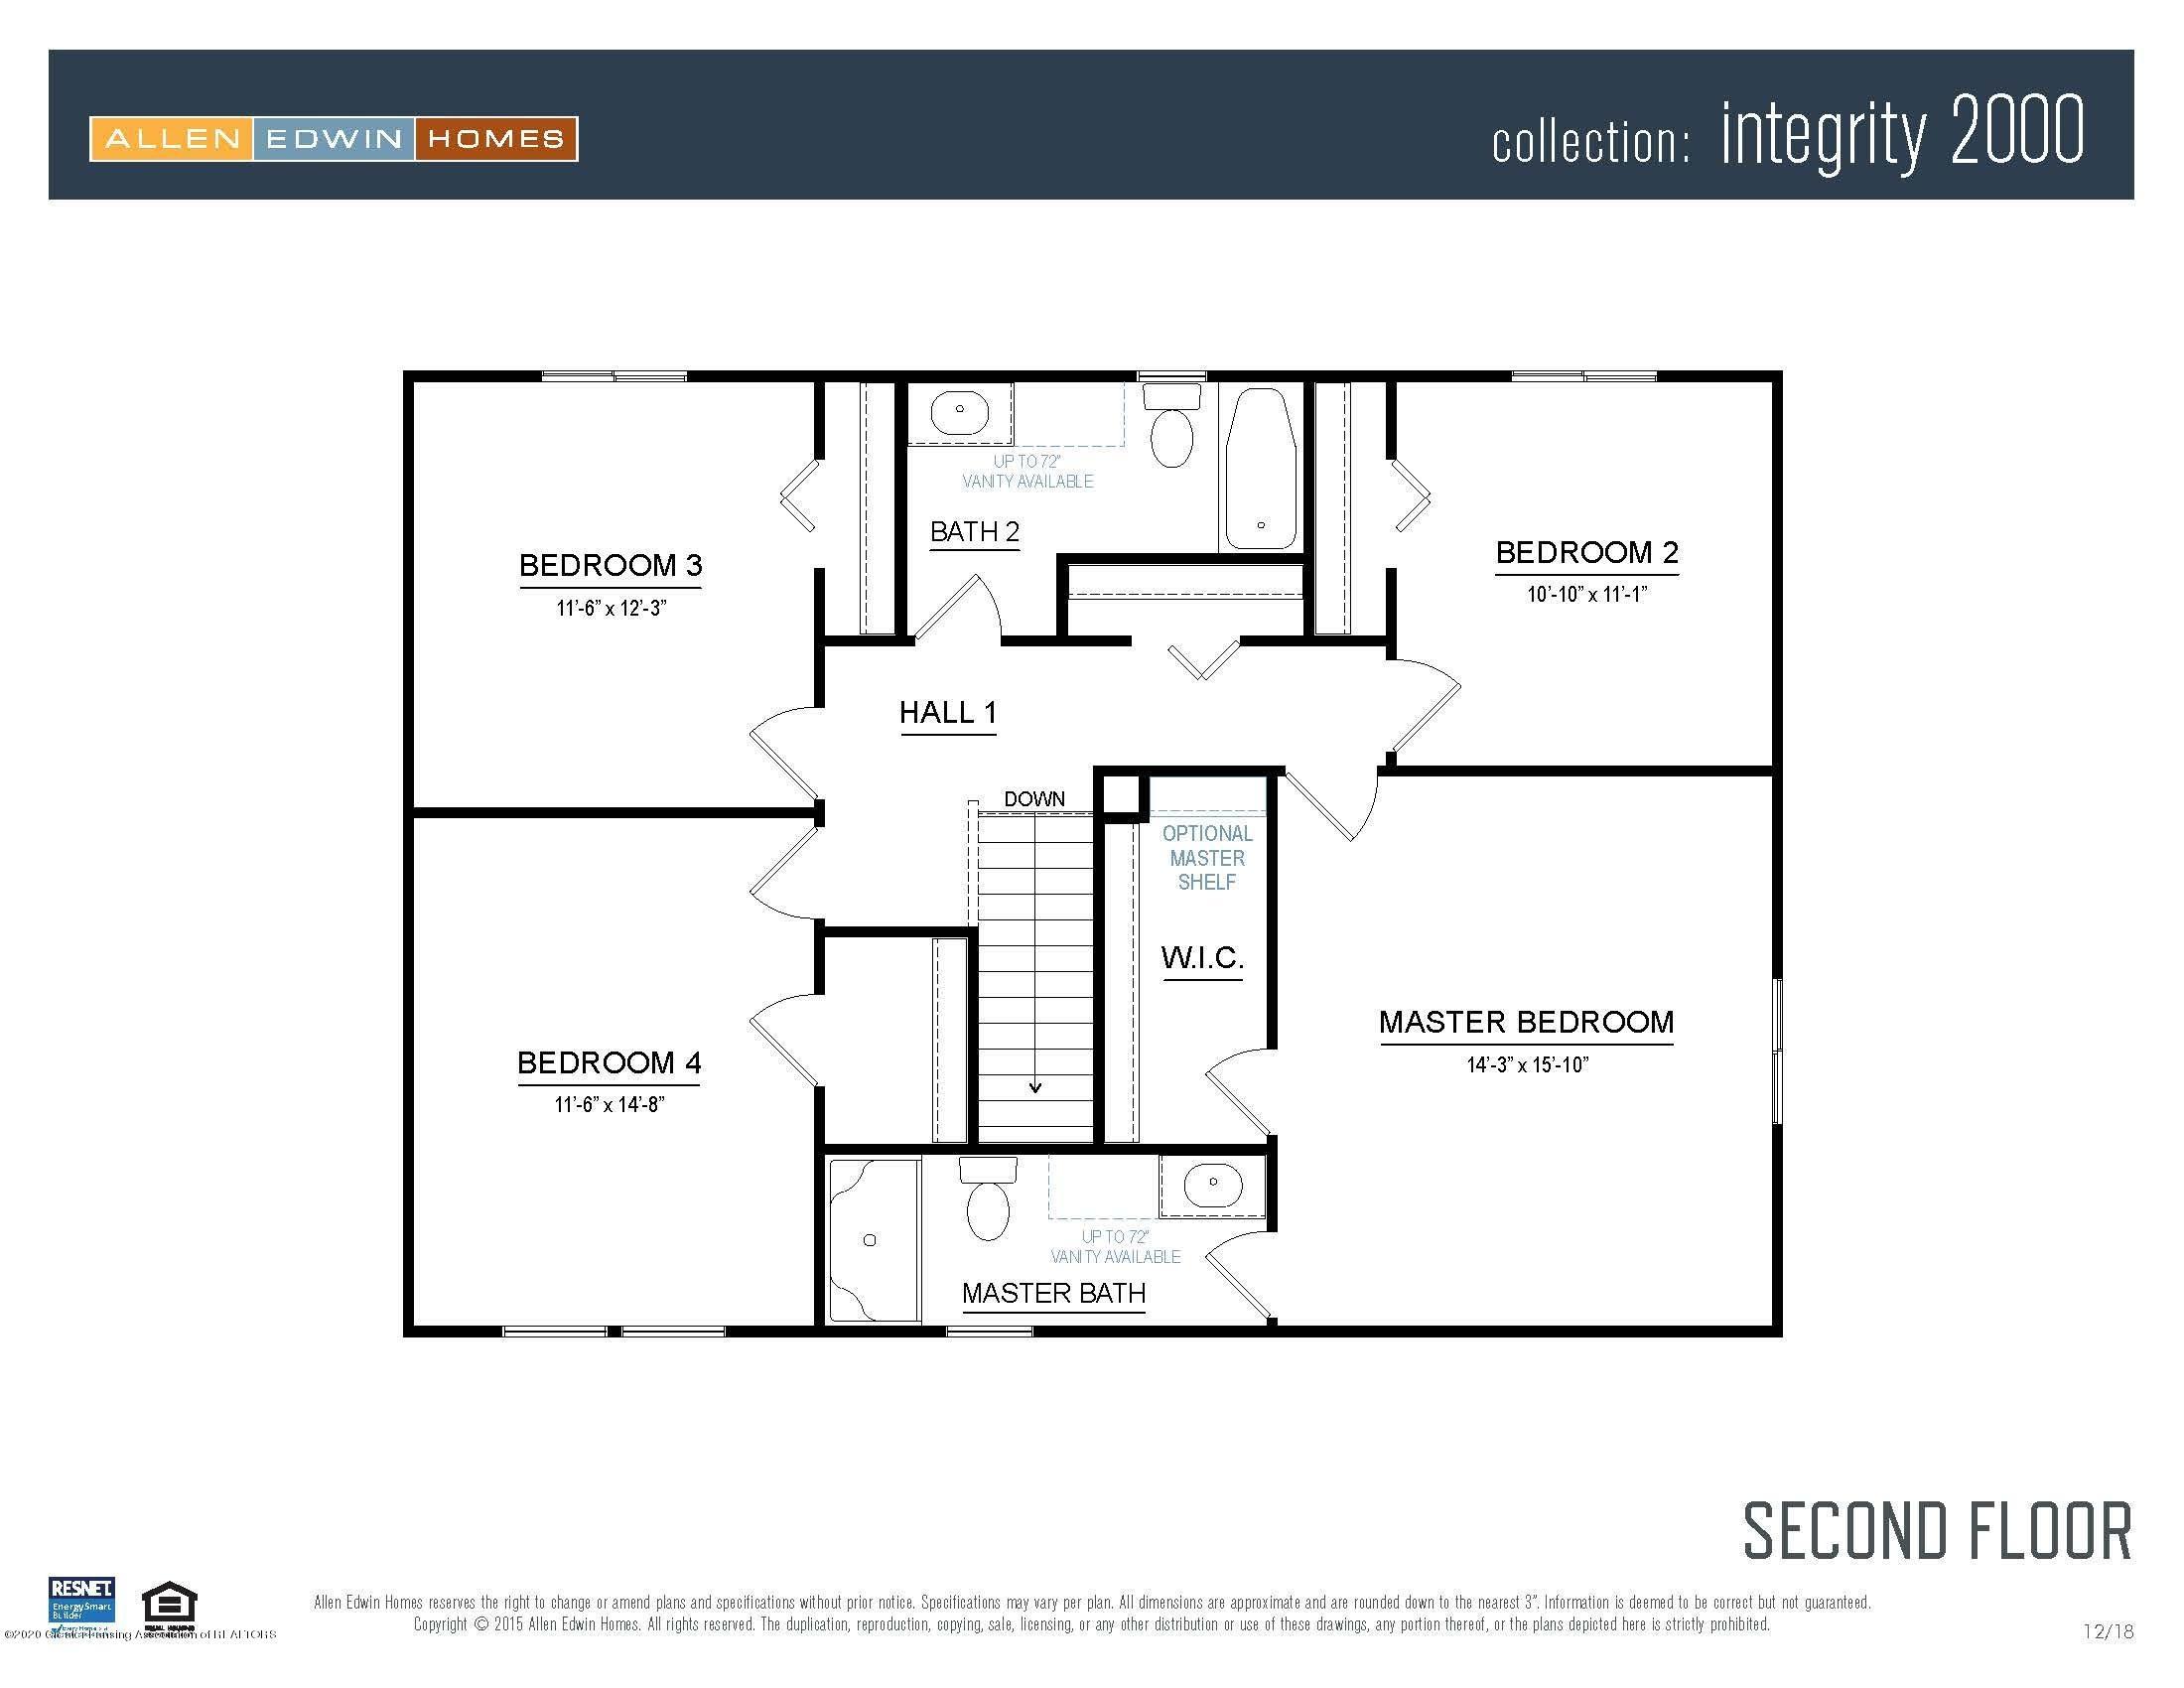 3793 Calypso Rd - Integrity 2000 V8.0a Second Floor - 20